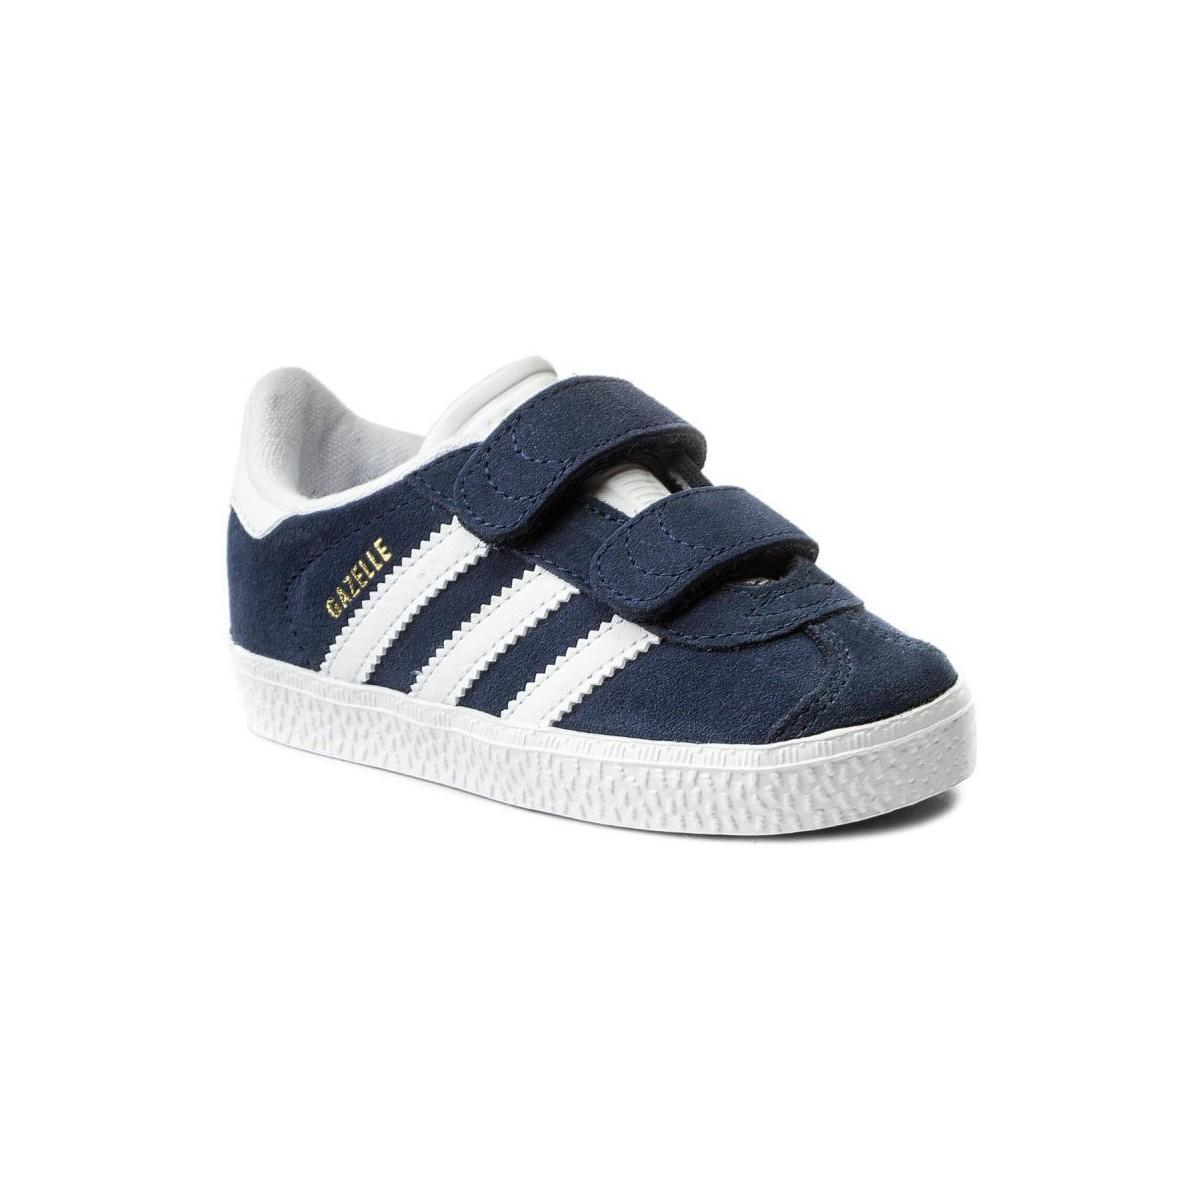 adidas gazelle bleu enfant,adidas gazelle bleu enfant vente,adidas ...